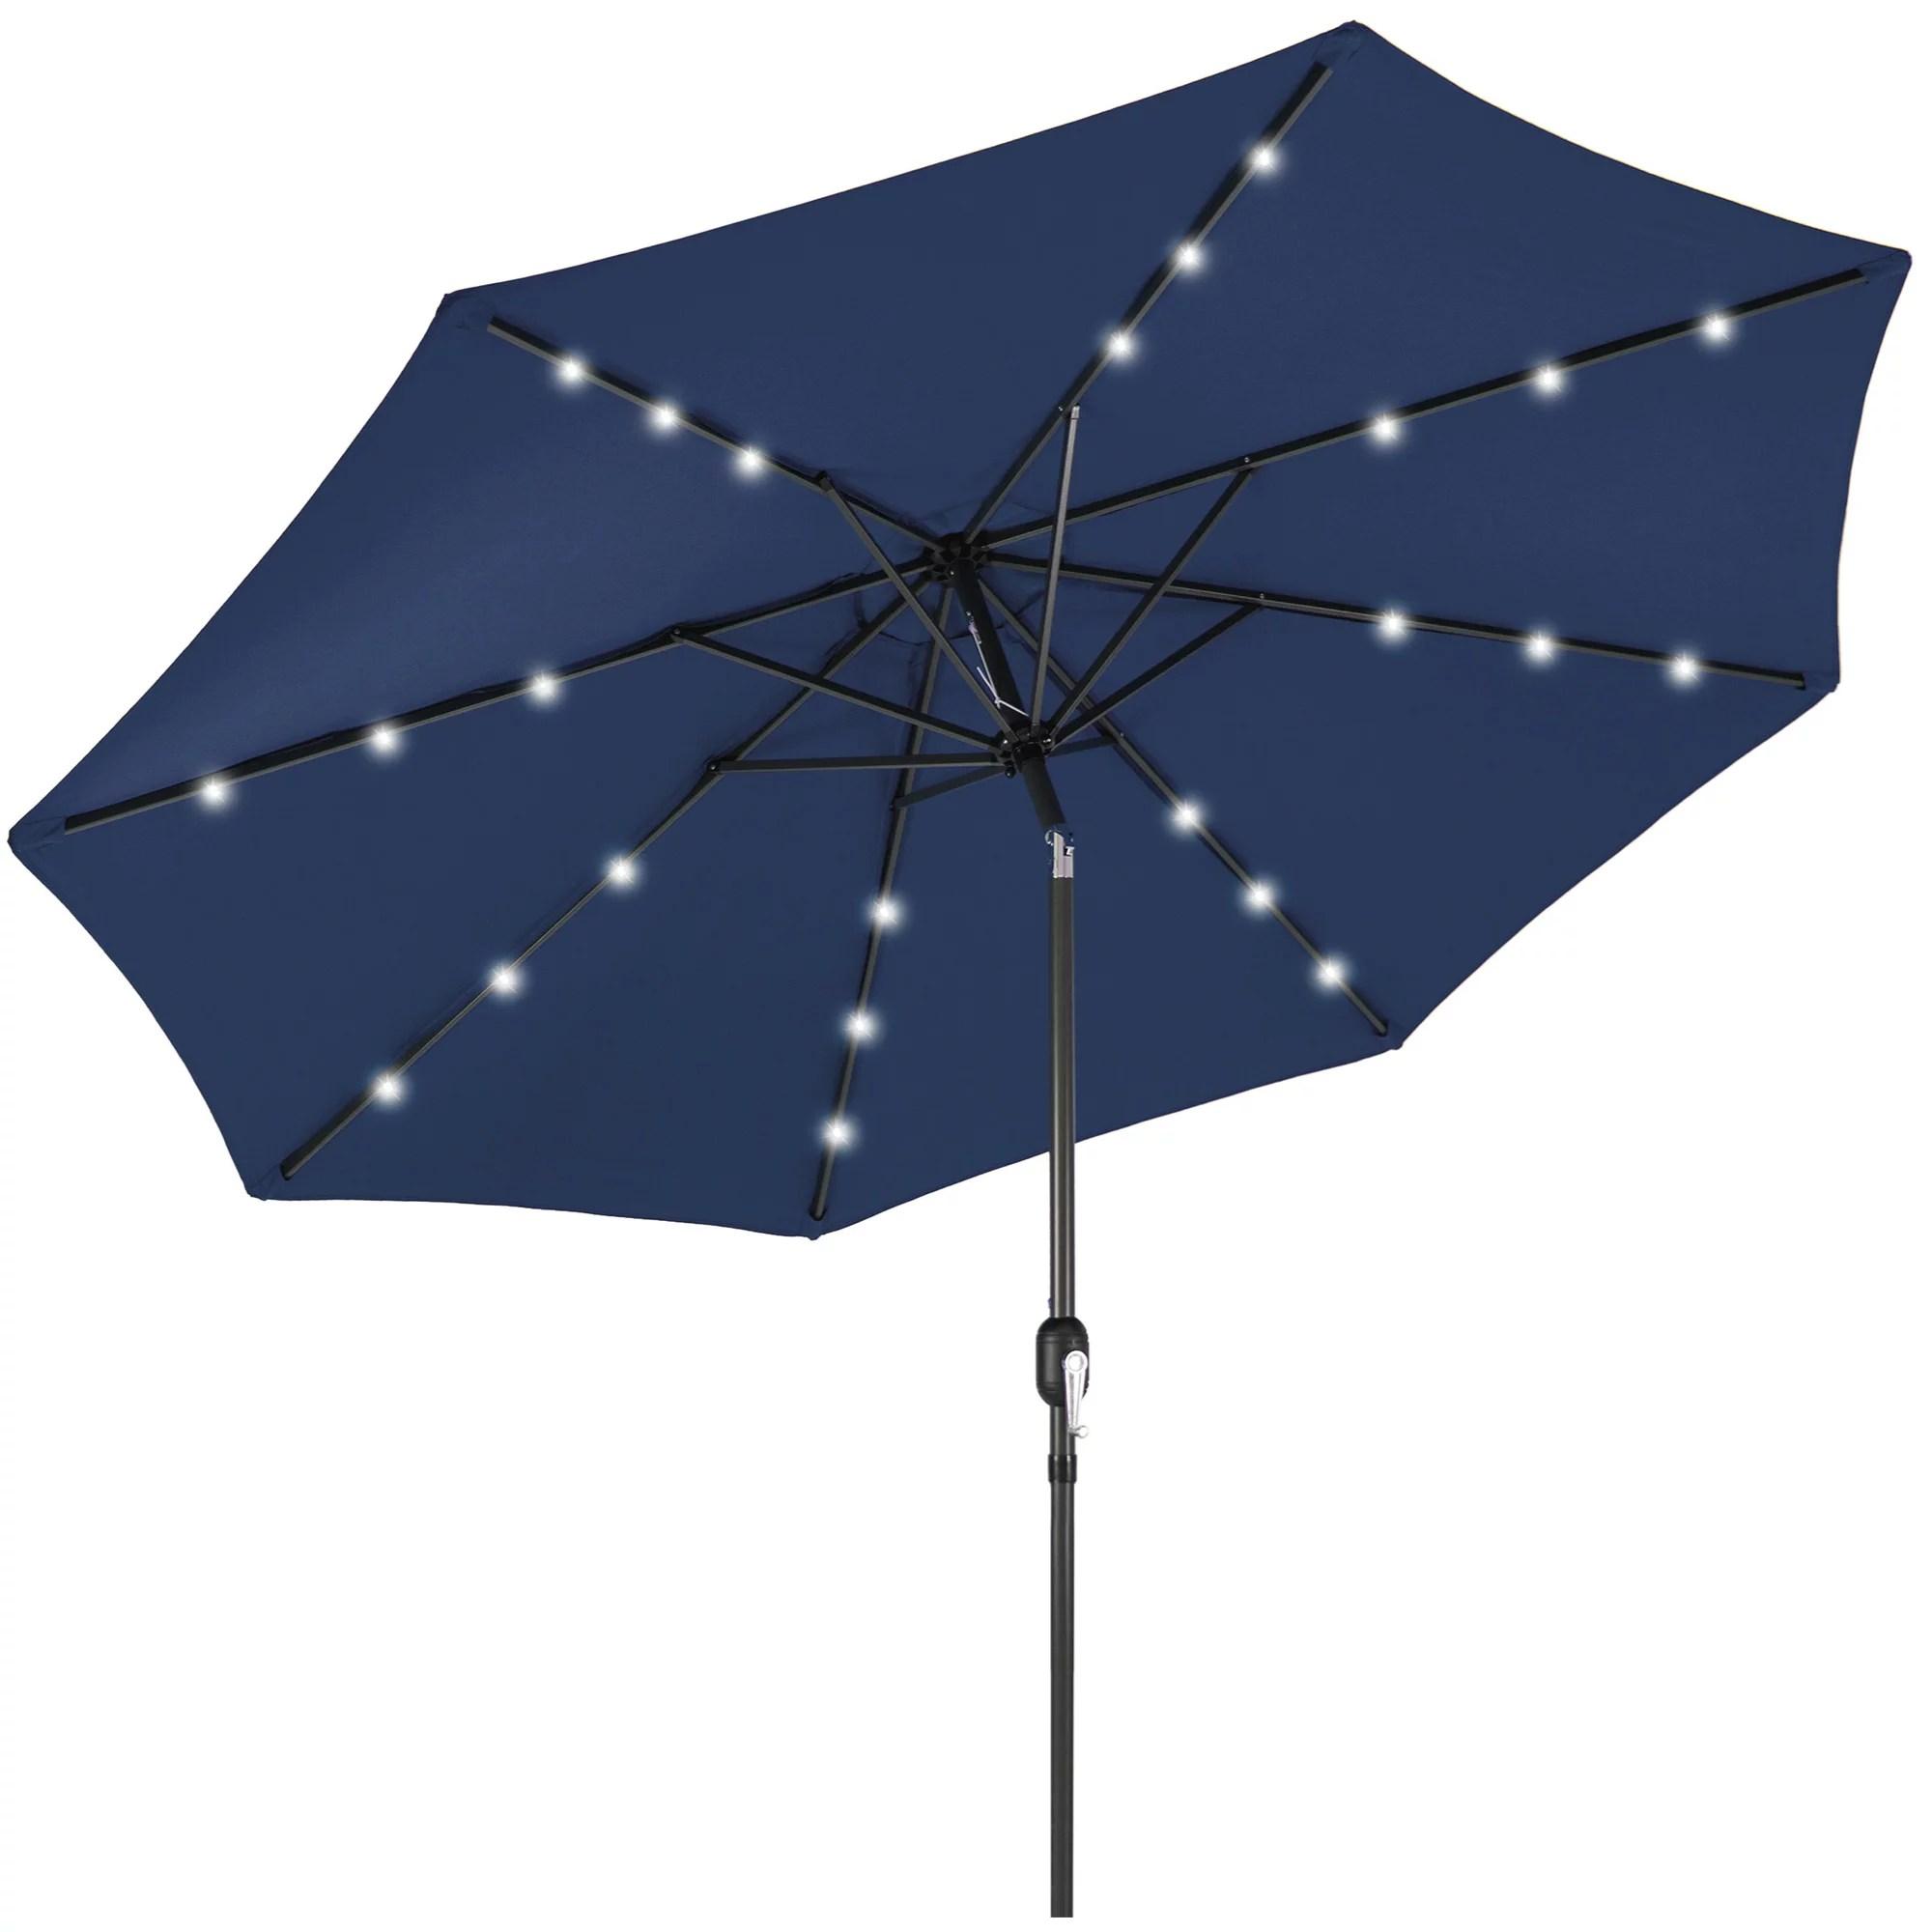 best choice products 10ft solar led lighted patio umbrella w tilt adjustment fade resistant fabric navy blue walmart com